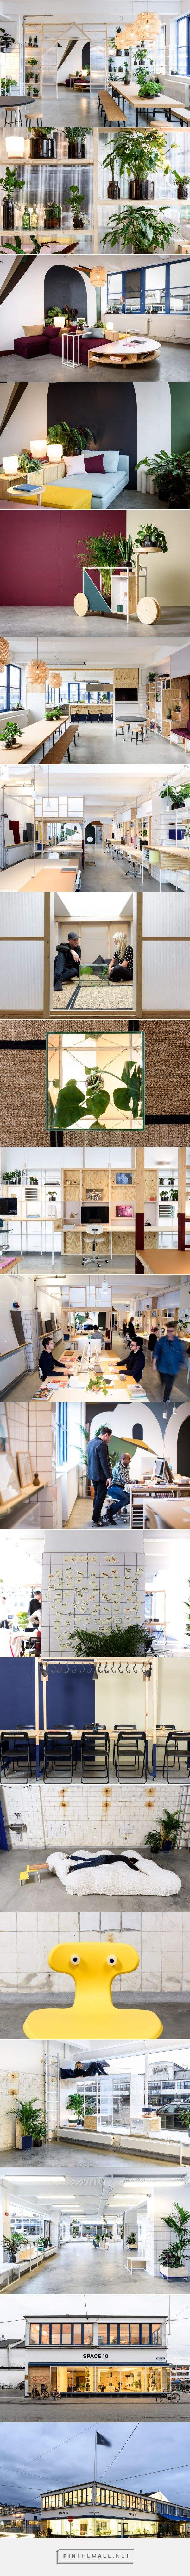 Space10: IKEA's New External Innovation Lab - Design Milk - created via https://pinthemall.net